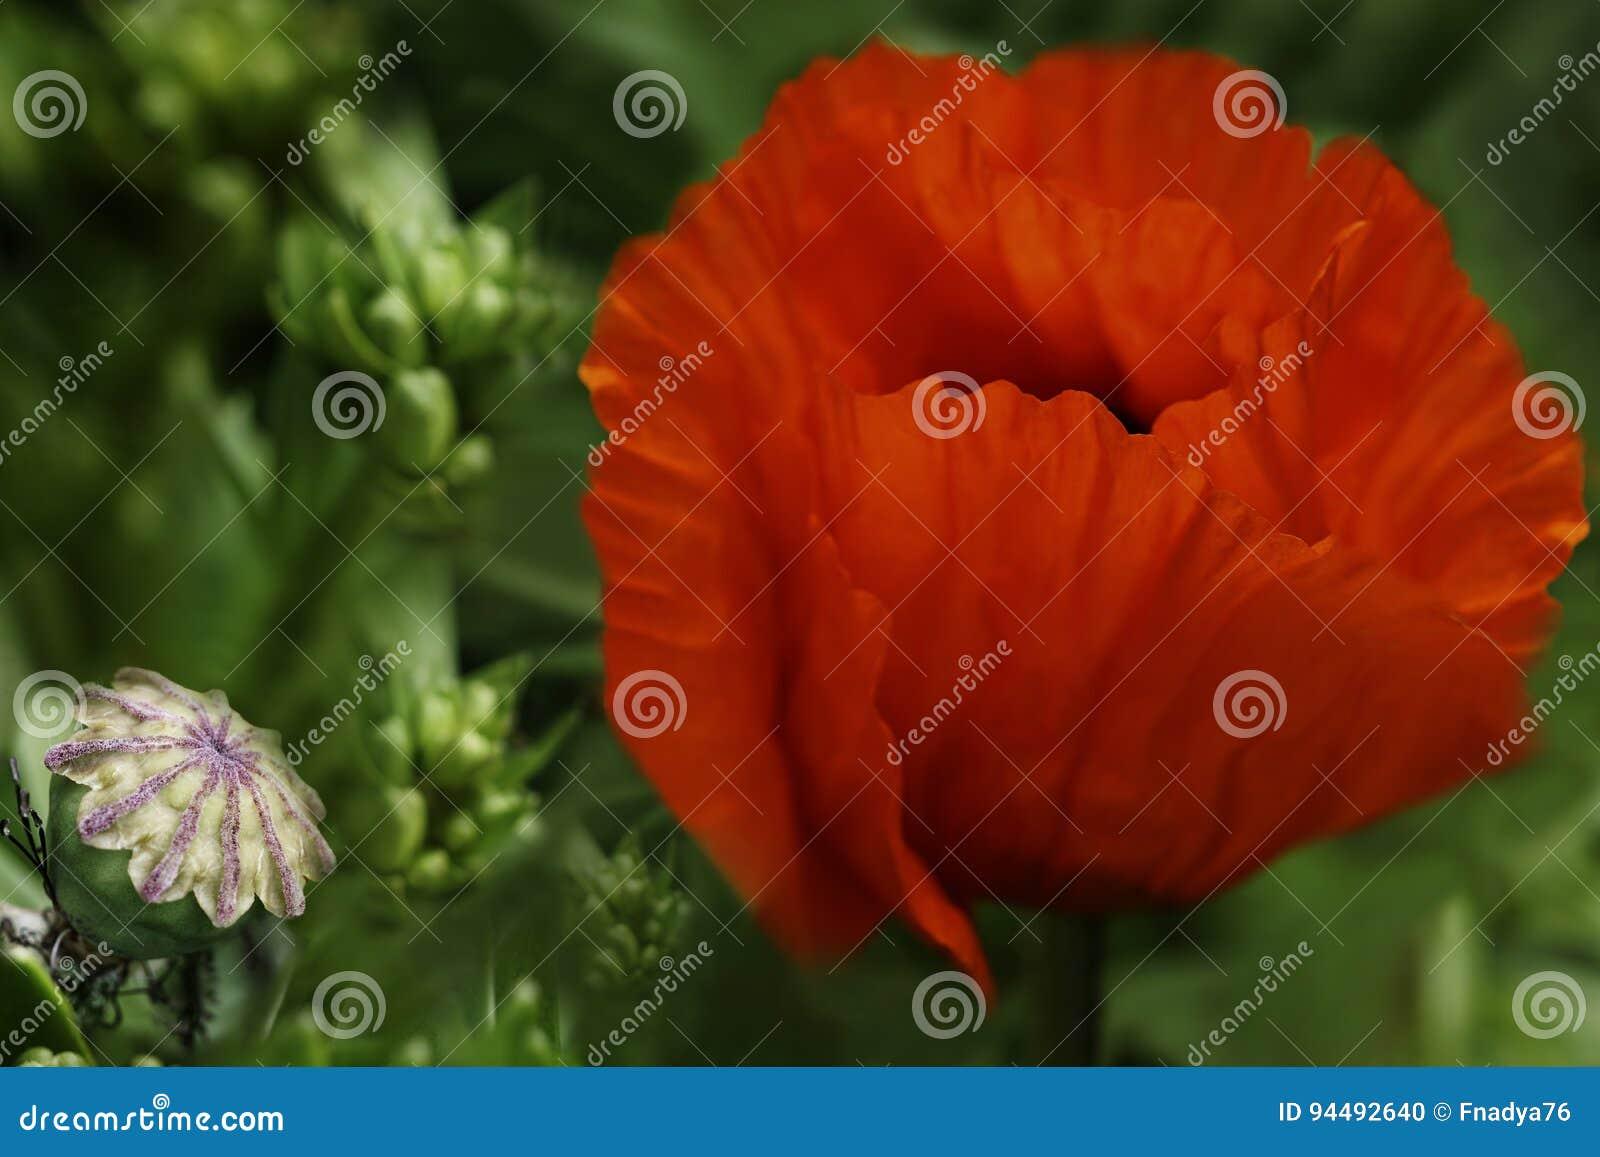 Red Poppy Flower On A Green Leaf Background A Beautiful Poppy